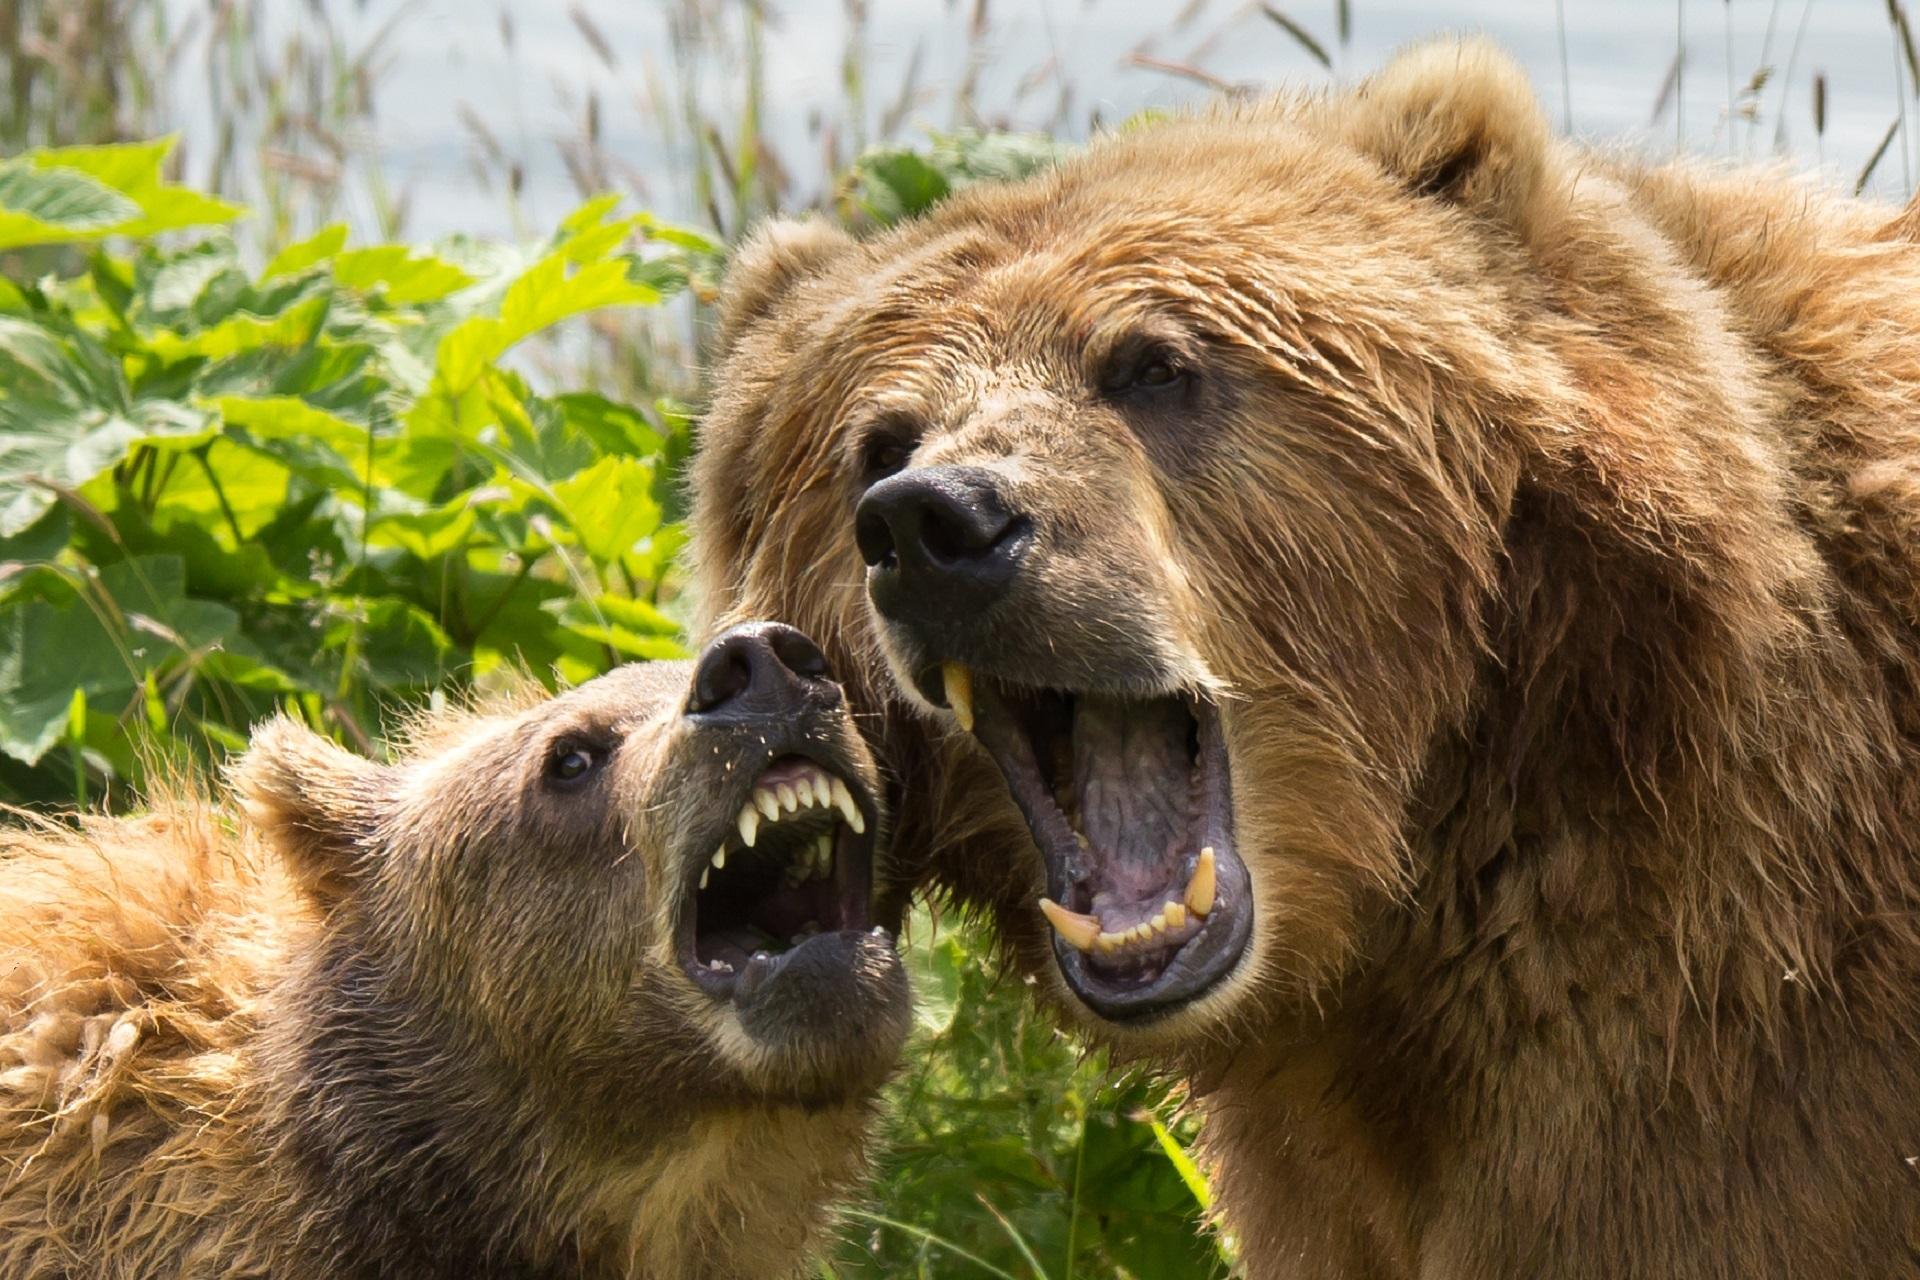 Kodiak Brown Bears, Animal, Bear, Brown, Grizzly, HQ Photo